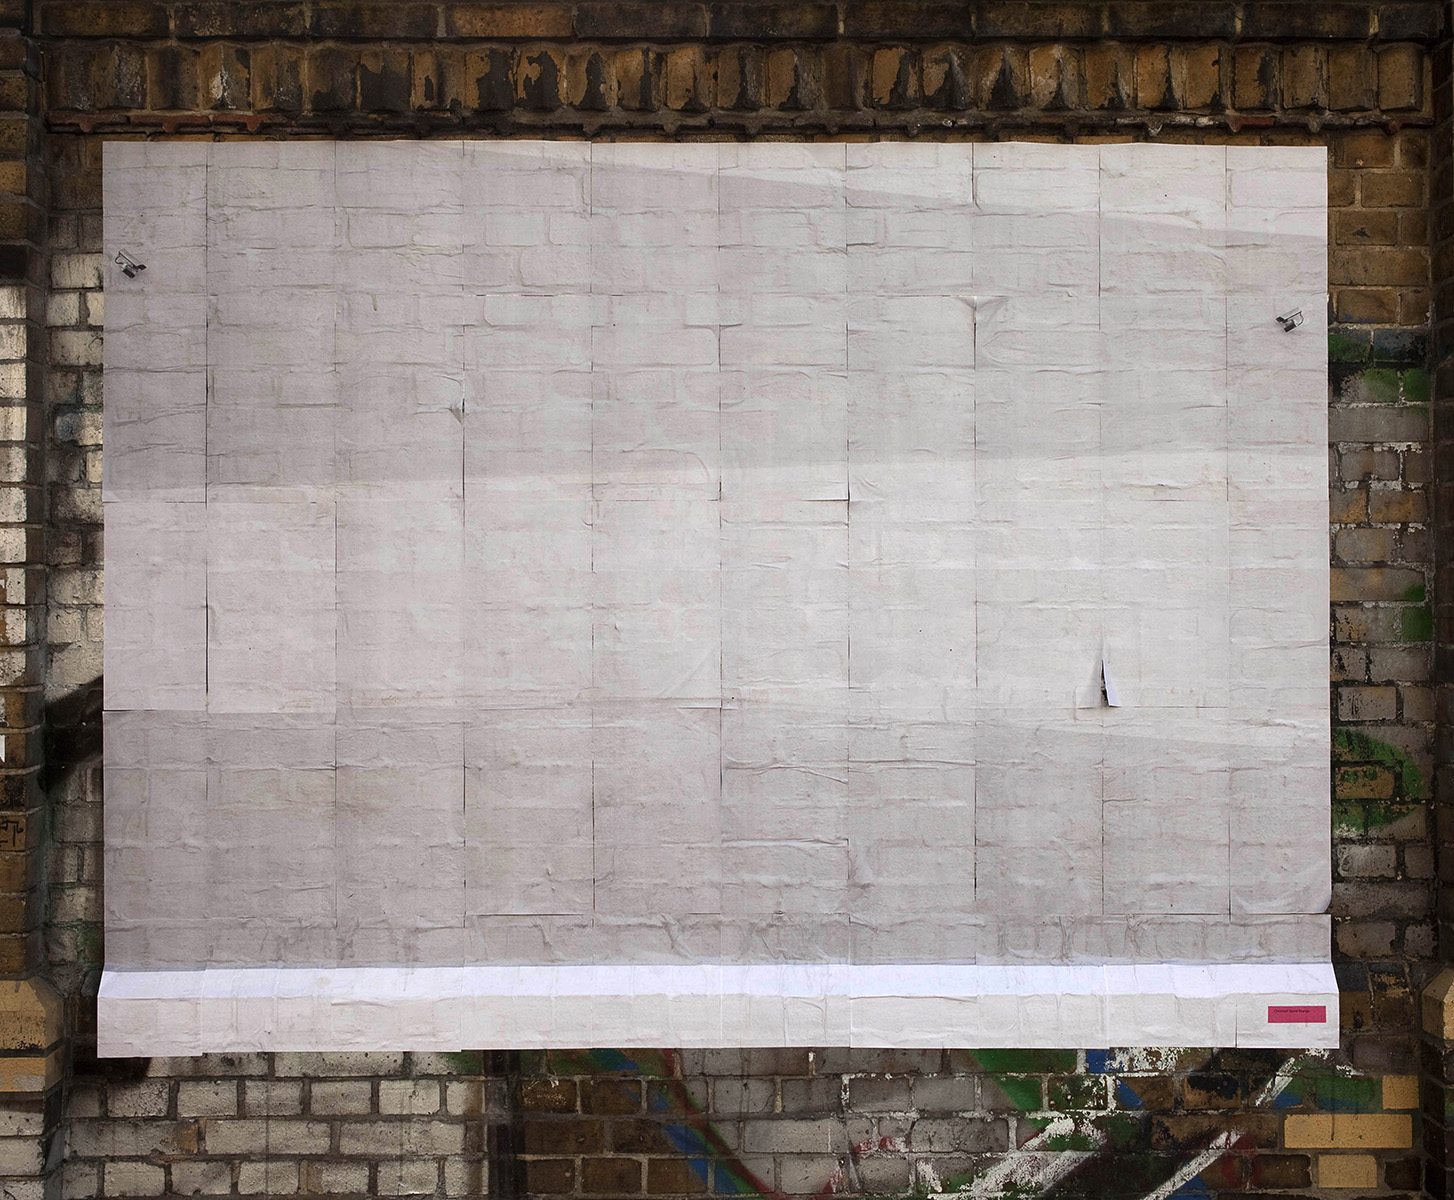 Chris Drange, Christoph David Drange, Wall #1, Kleister, Installation view, exhibition